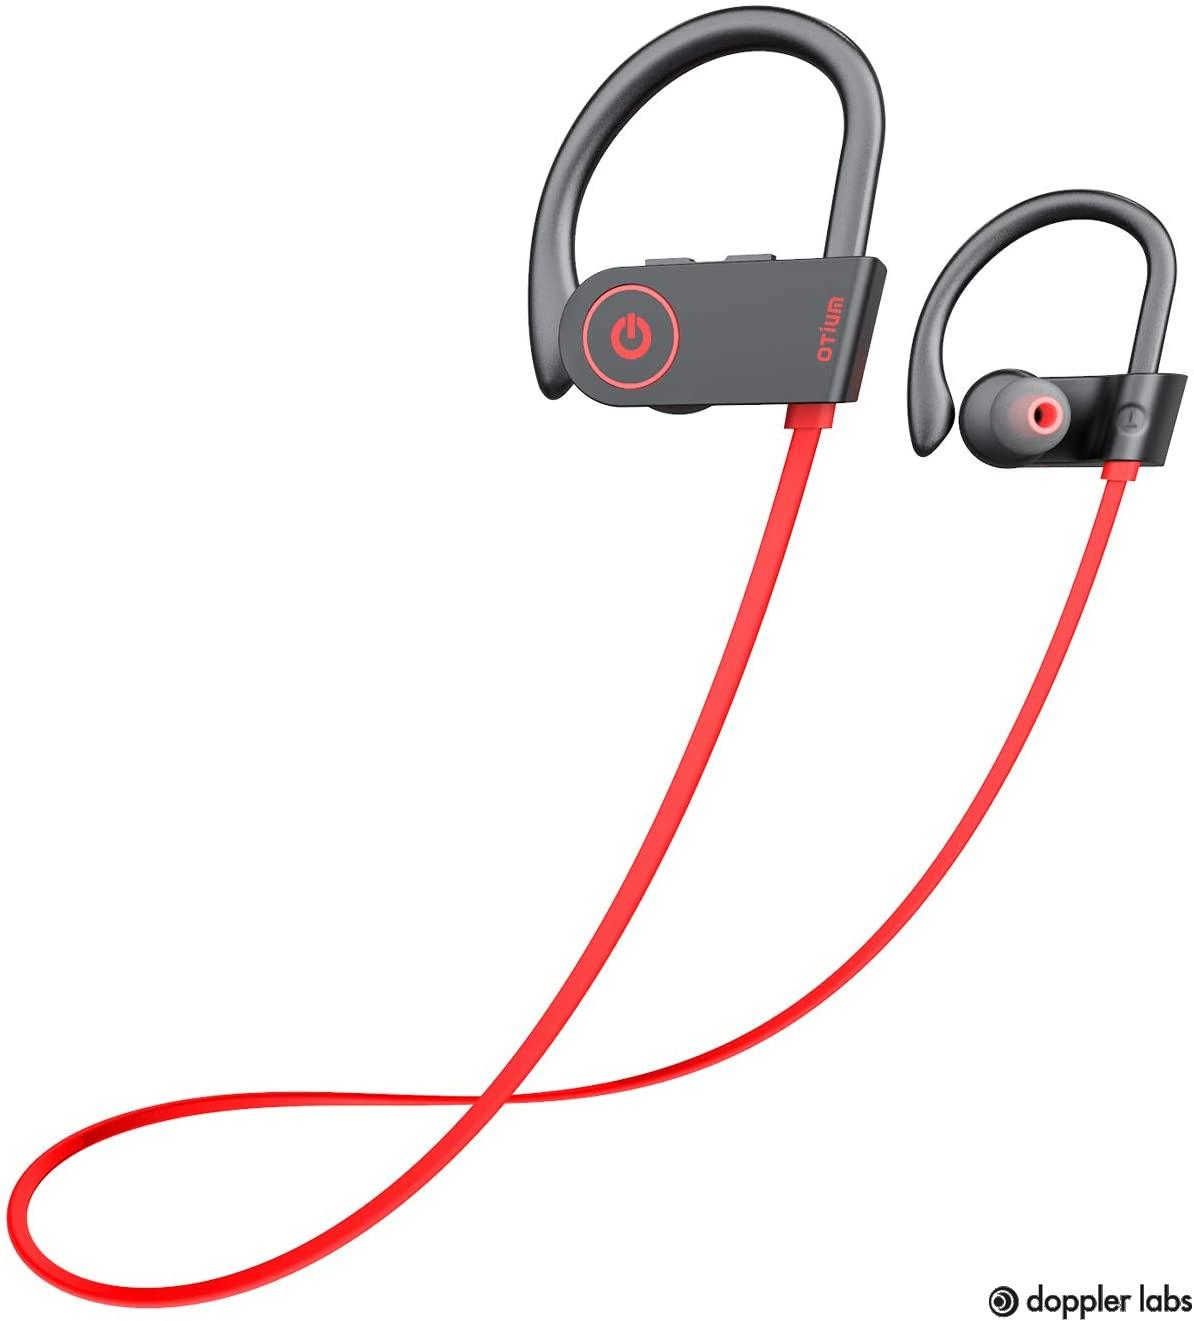 Otium Bluetooth Wireless Earbuds